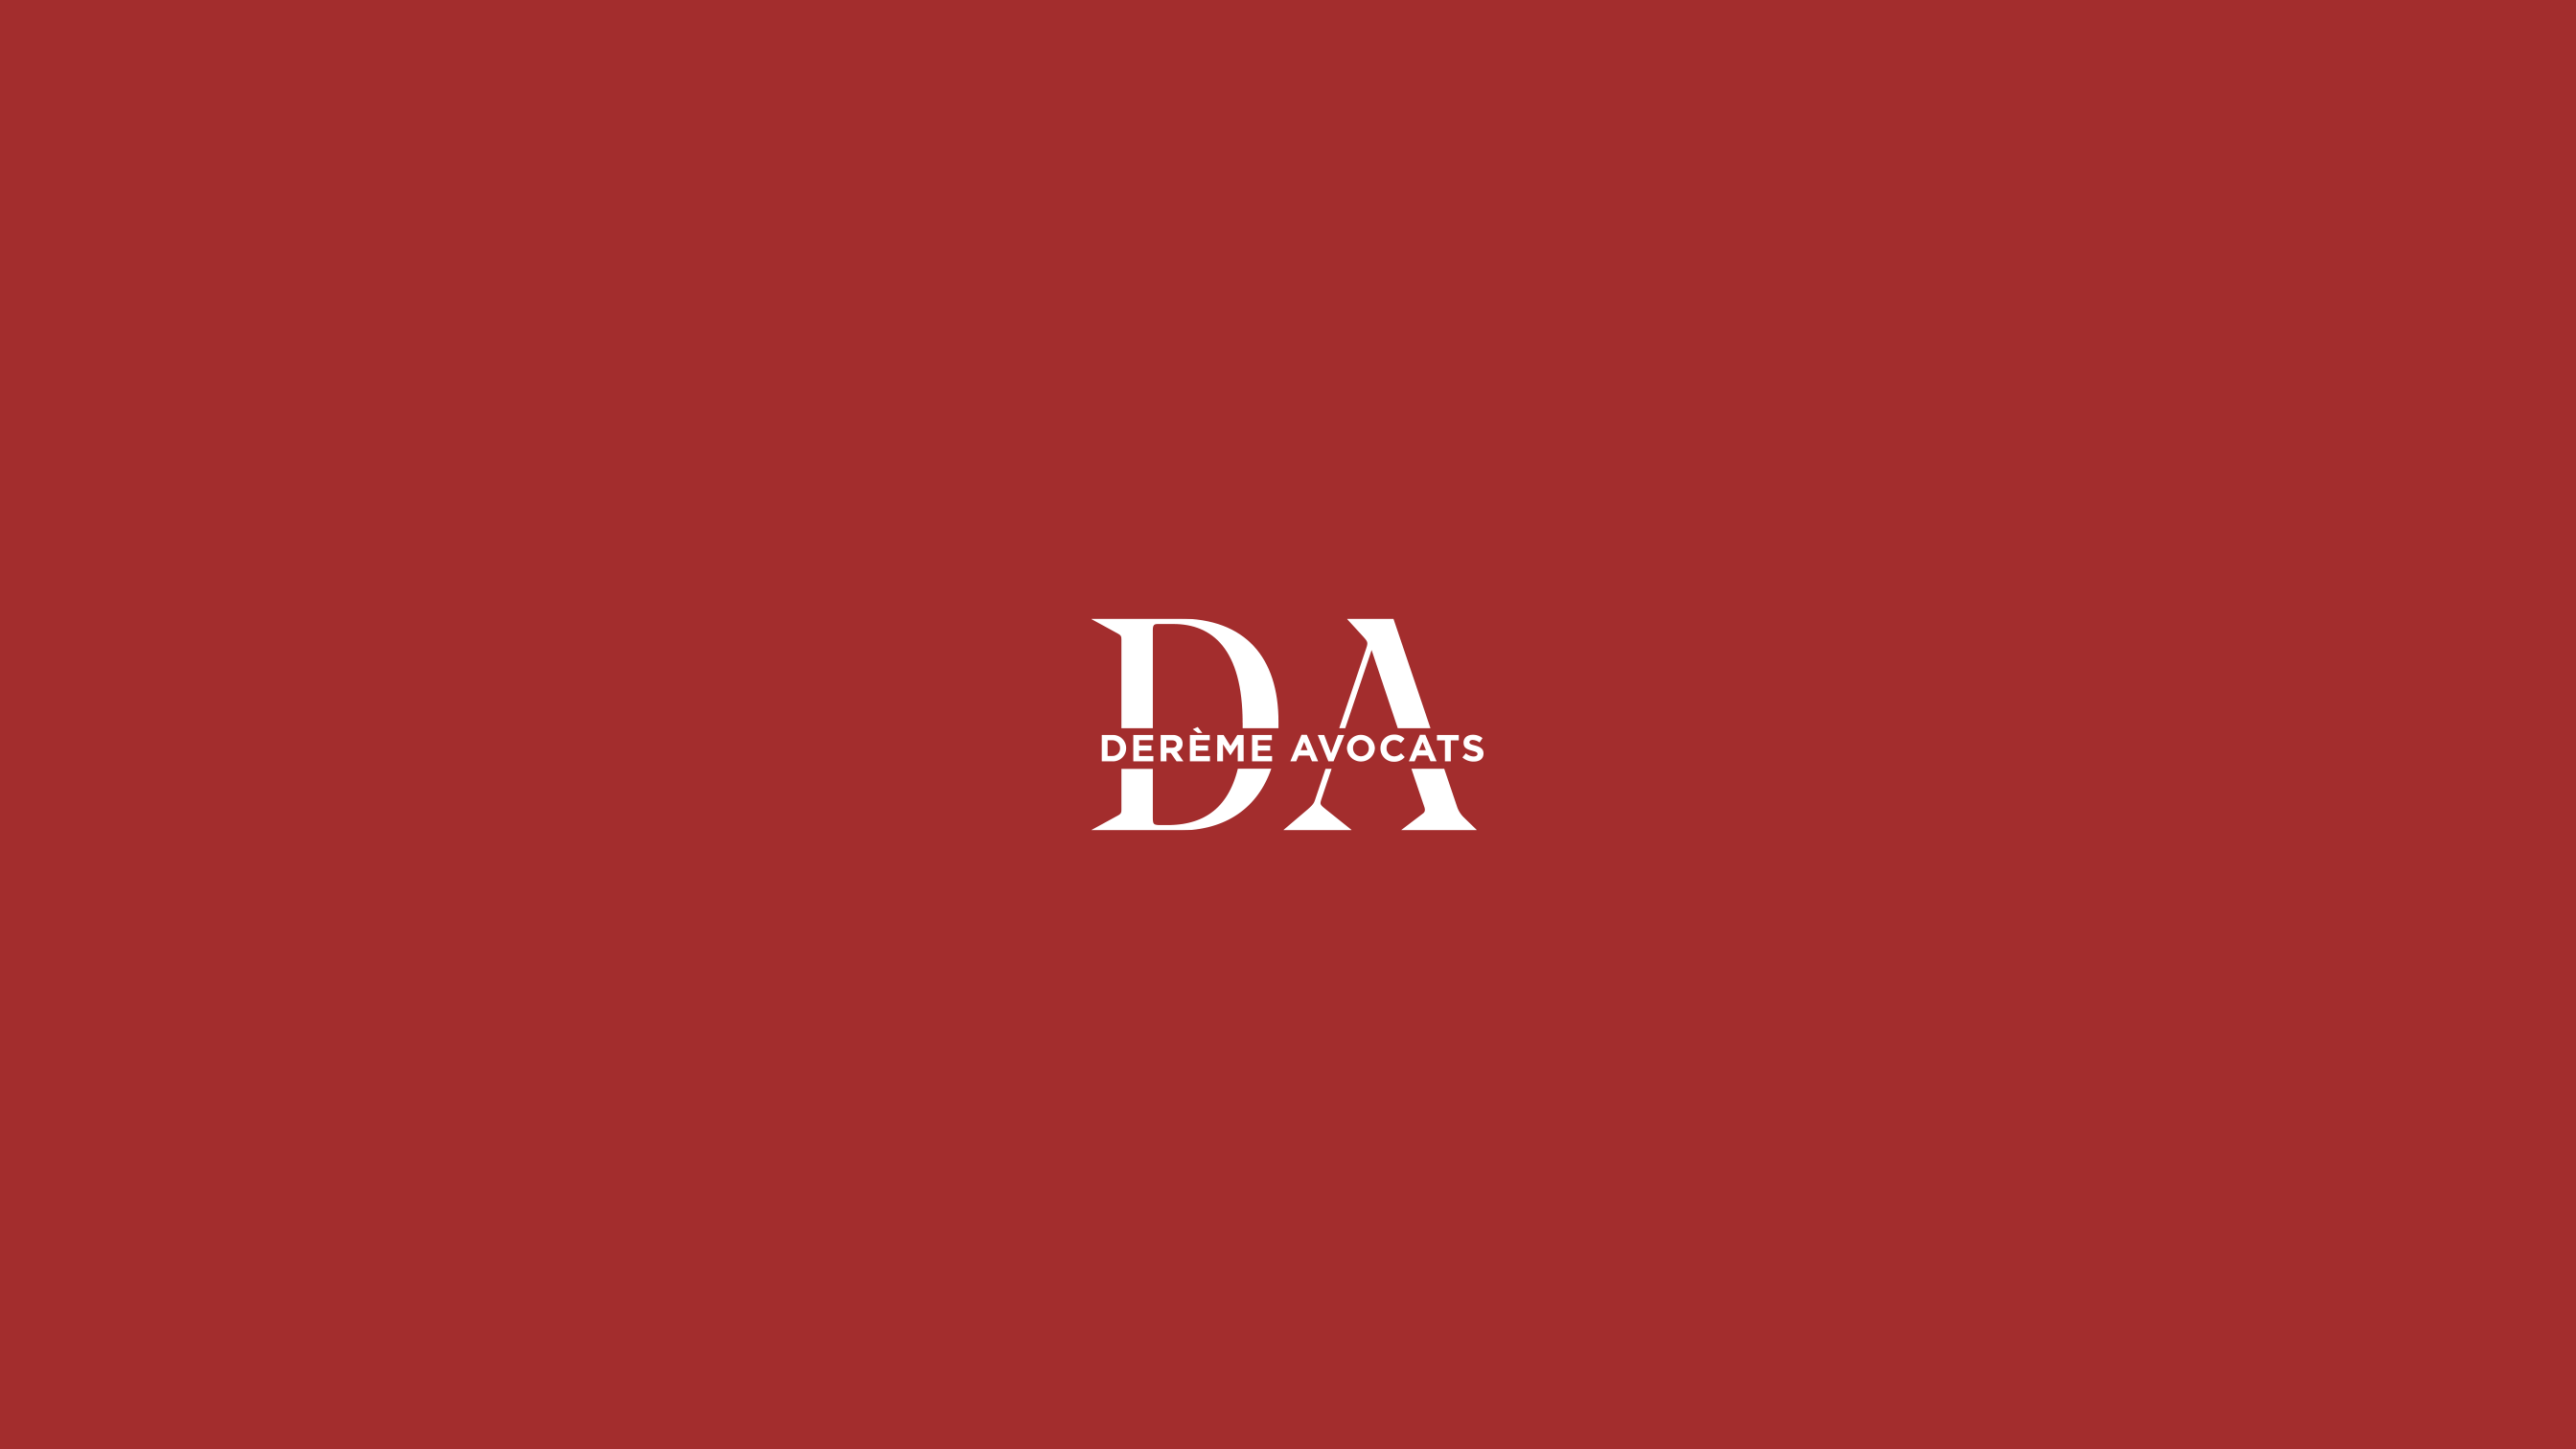 01-da-logo-pikteo-webdesign-graphic-design-freelance-paris-bruxelles-londres